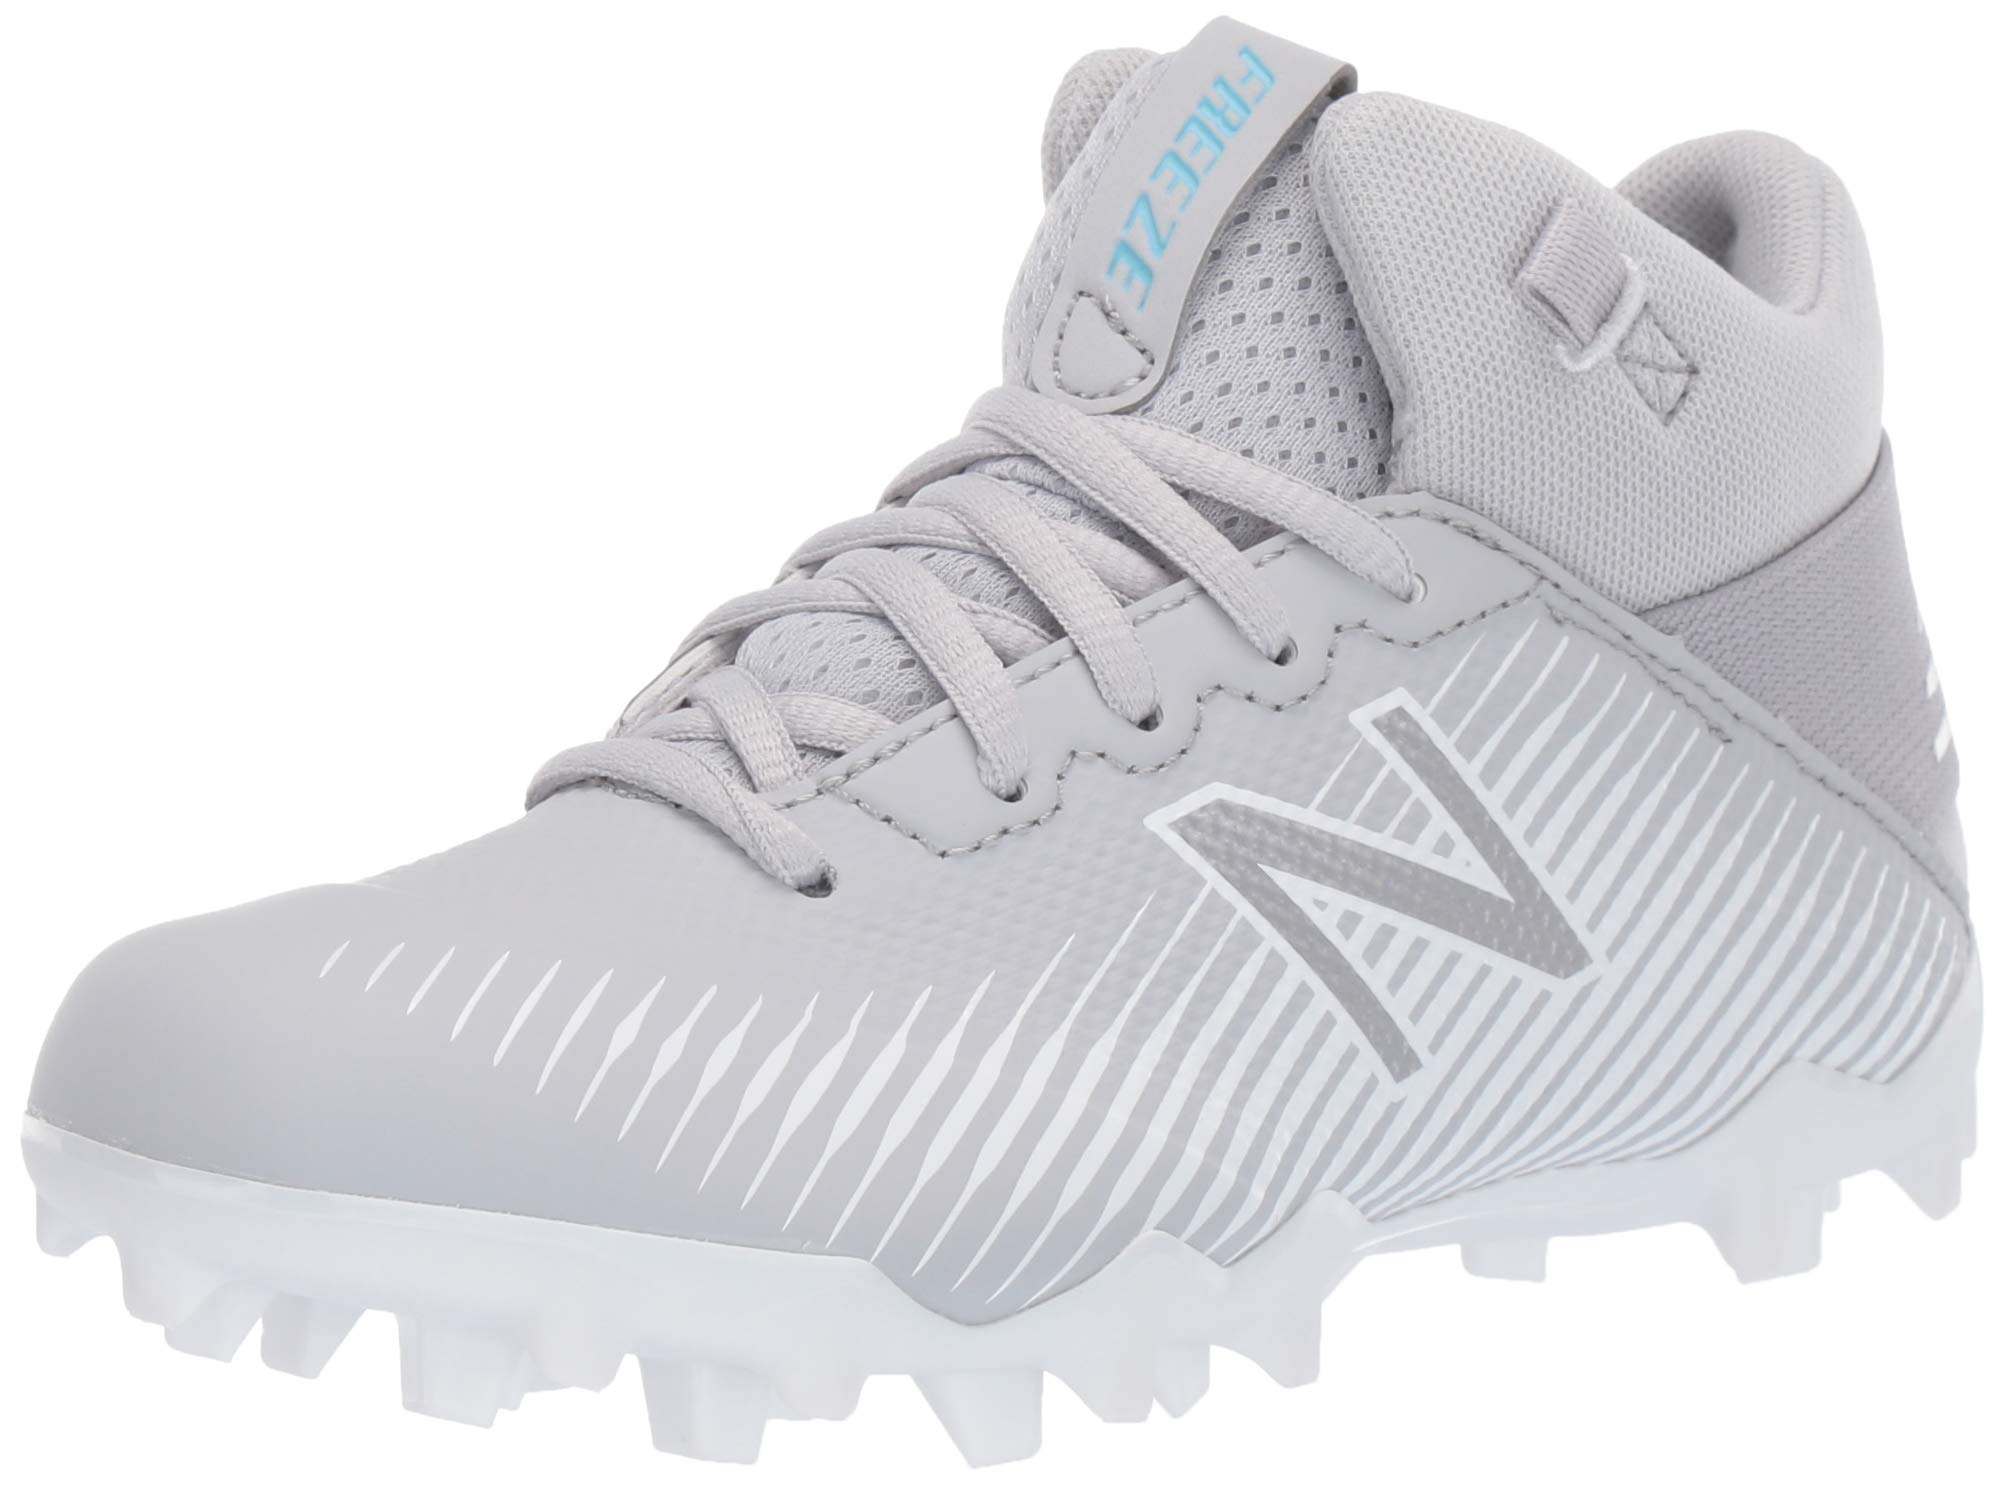 New Balance Boys' Freeze V2 Agility Lacrosse Shoe, Grey/White, 2 M US Little Kid